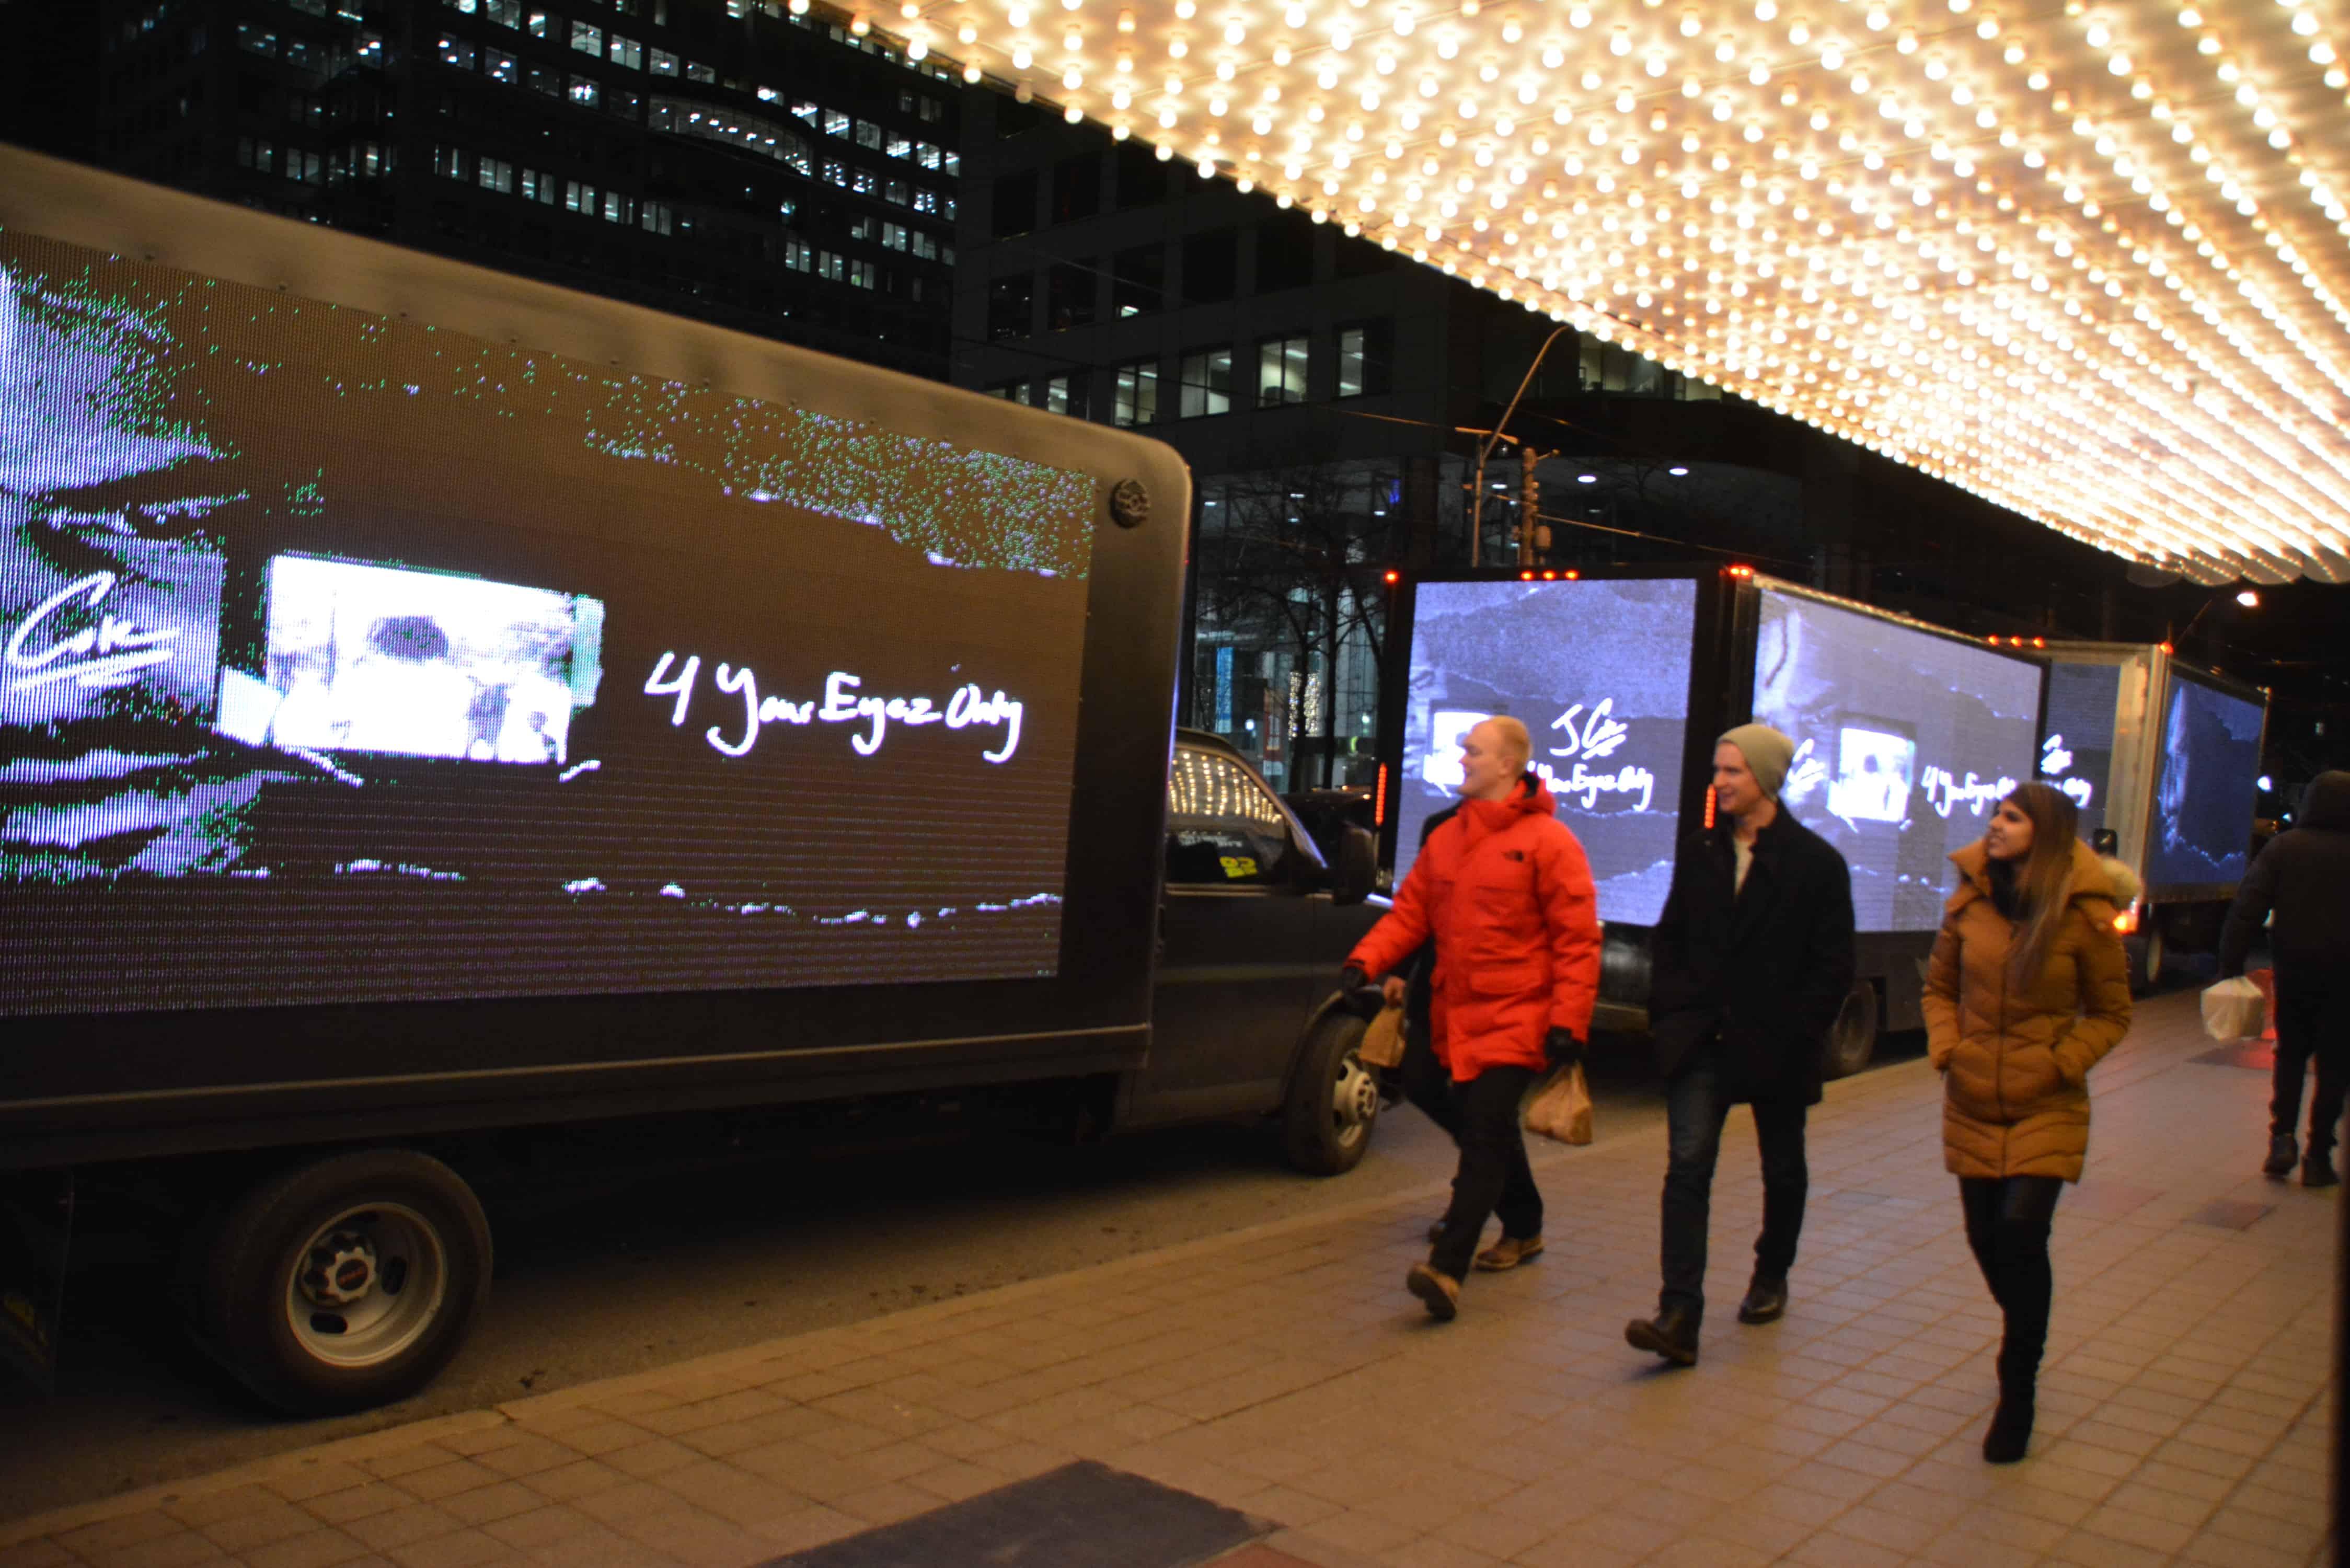 Digital video mobile billboards